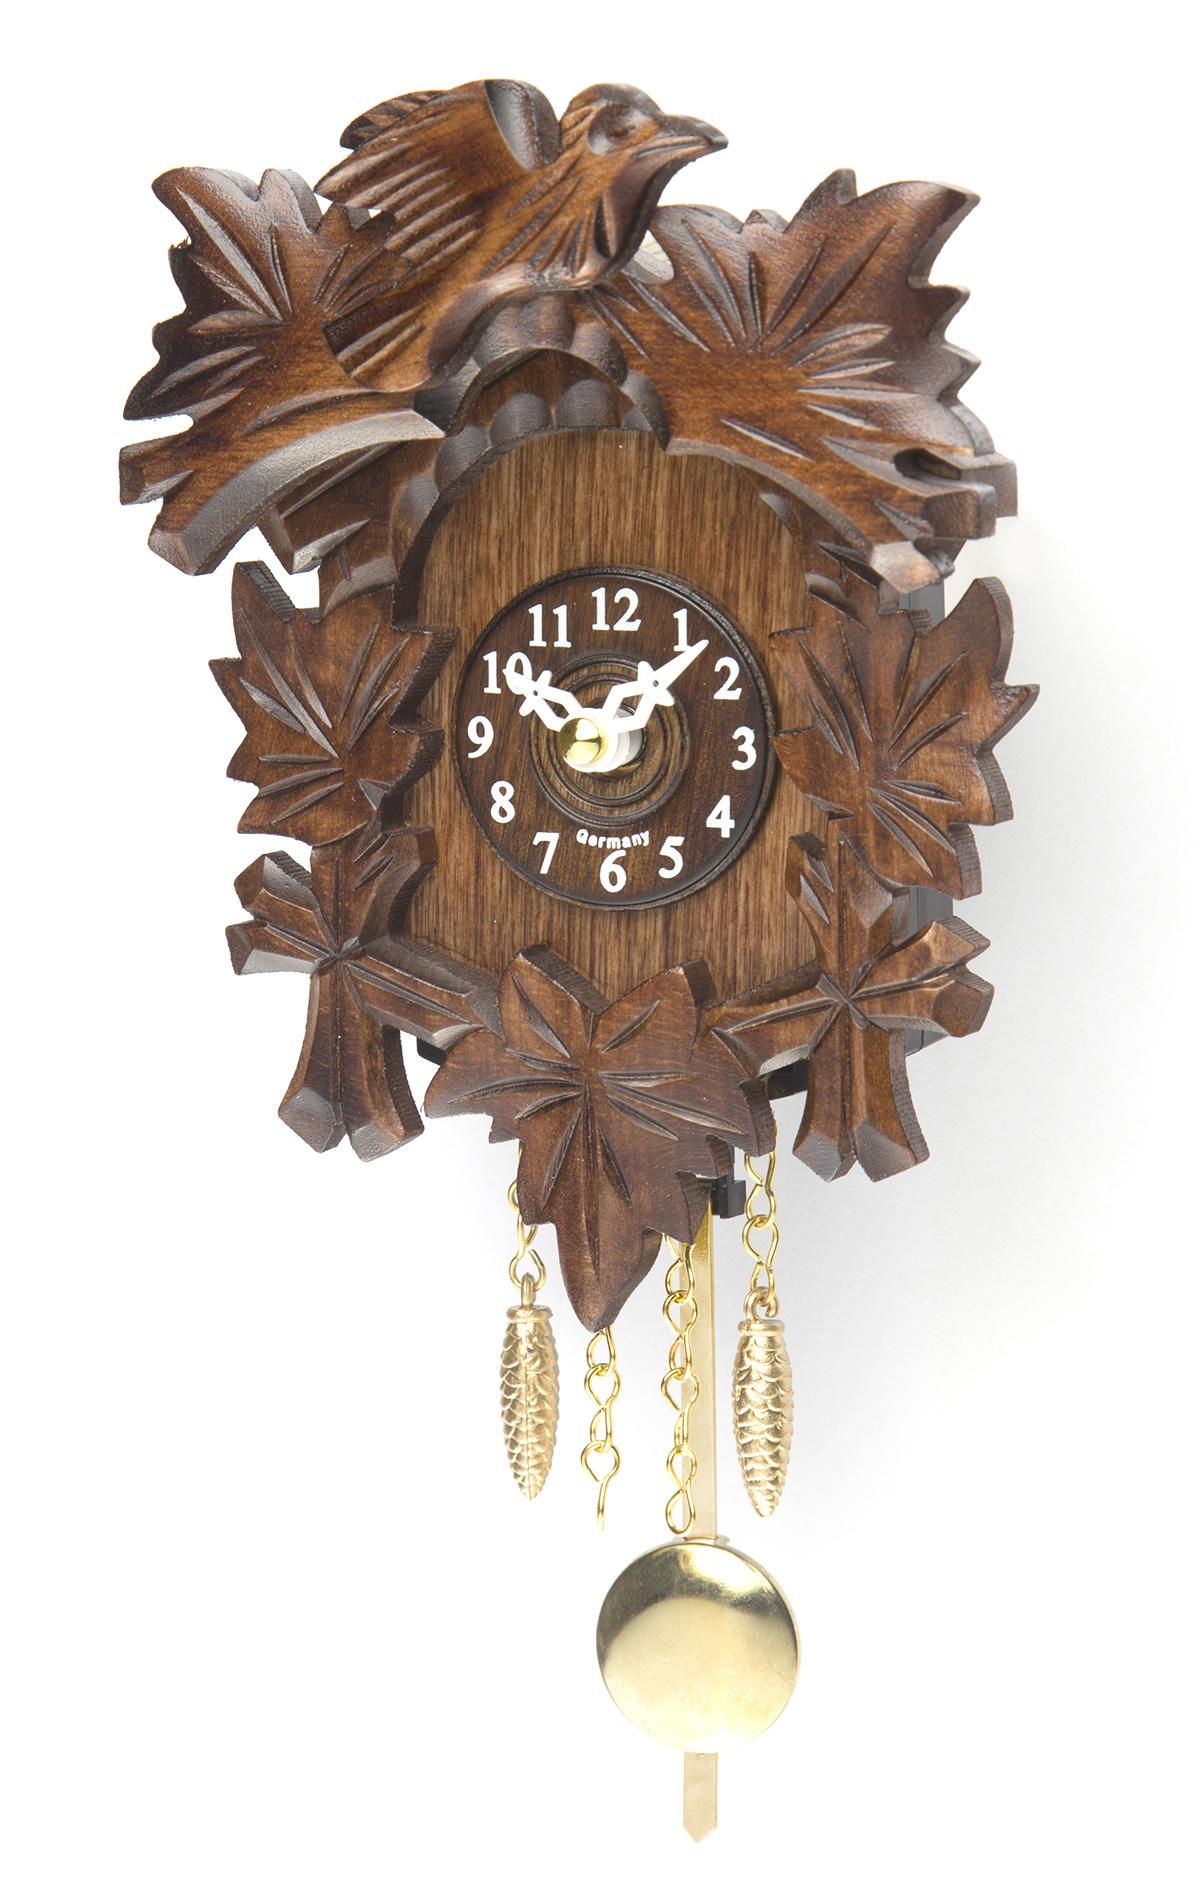 Часы настенные Часы настенные Tomas Stern 5014 chasy-nastennye-tomas-stern-5014-germaniya-tayvan.jpg